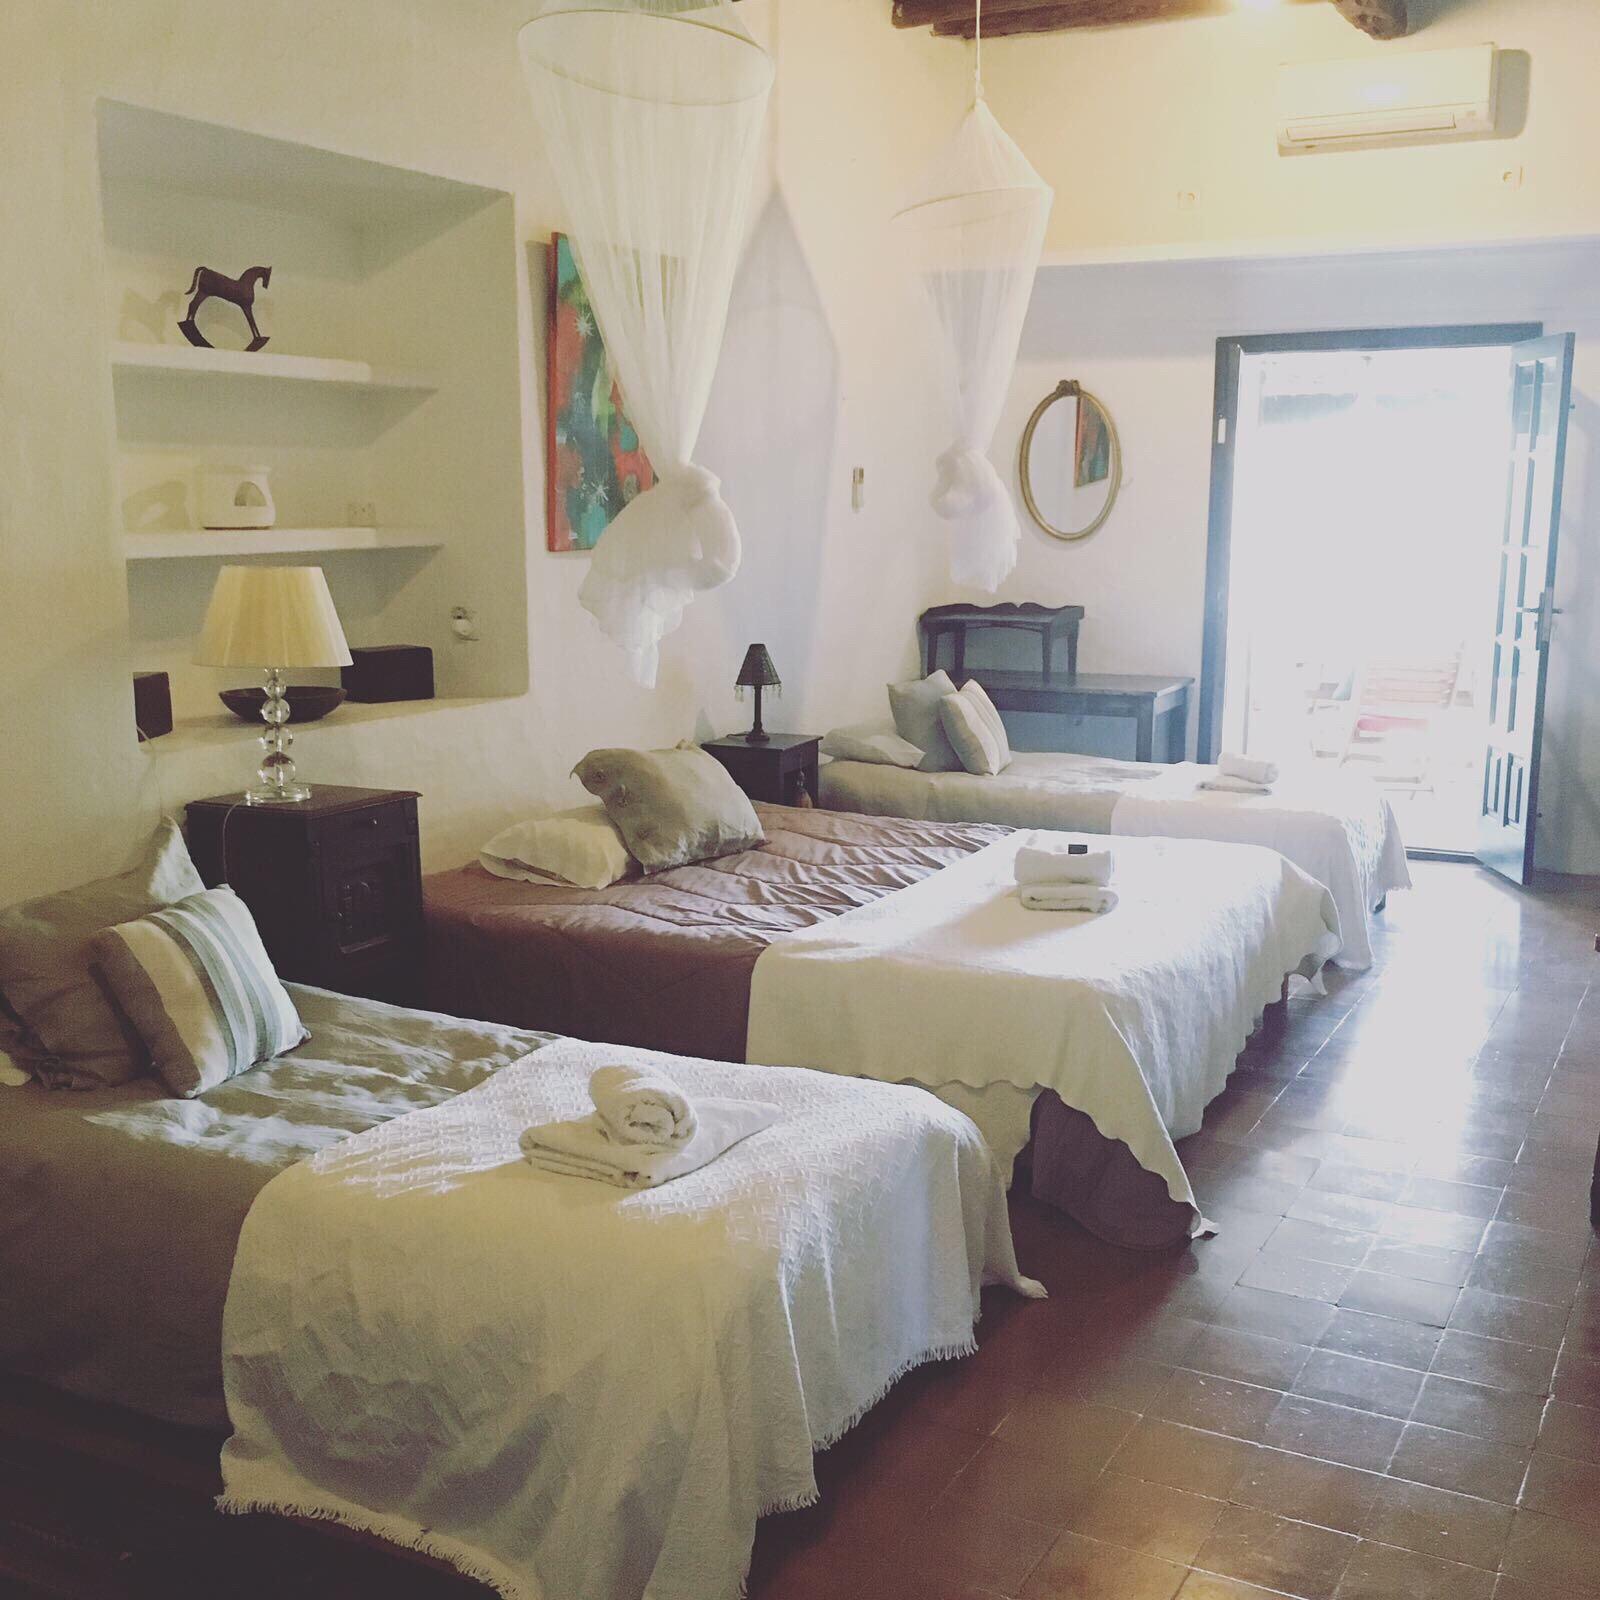 Yoga holiday - Ananda bedrooms